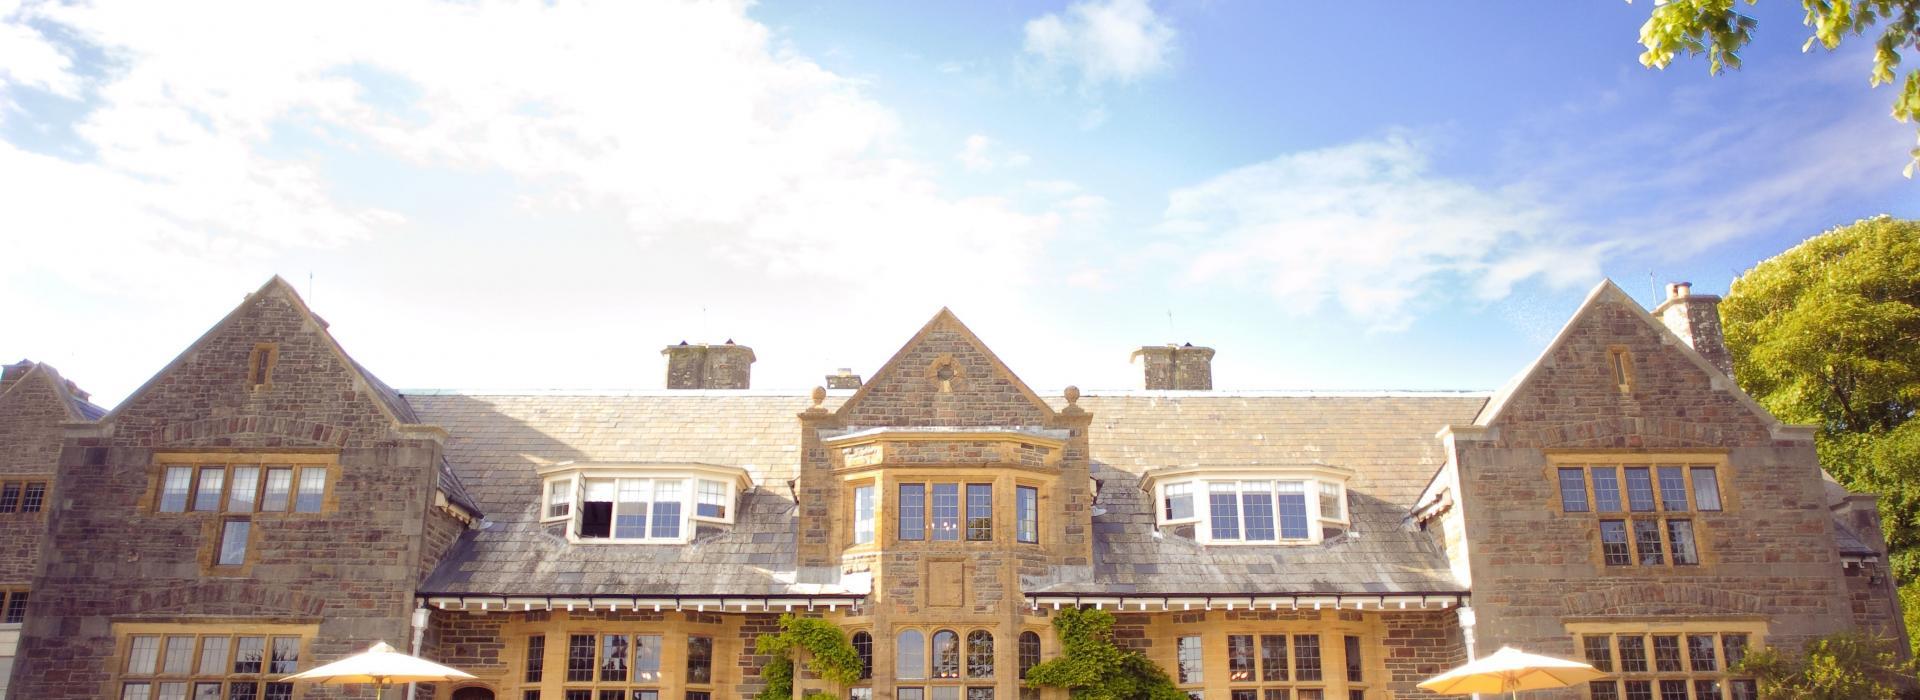 Pickwell Manor coastal holiday accommodation croyde devon